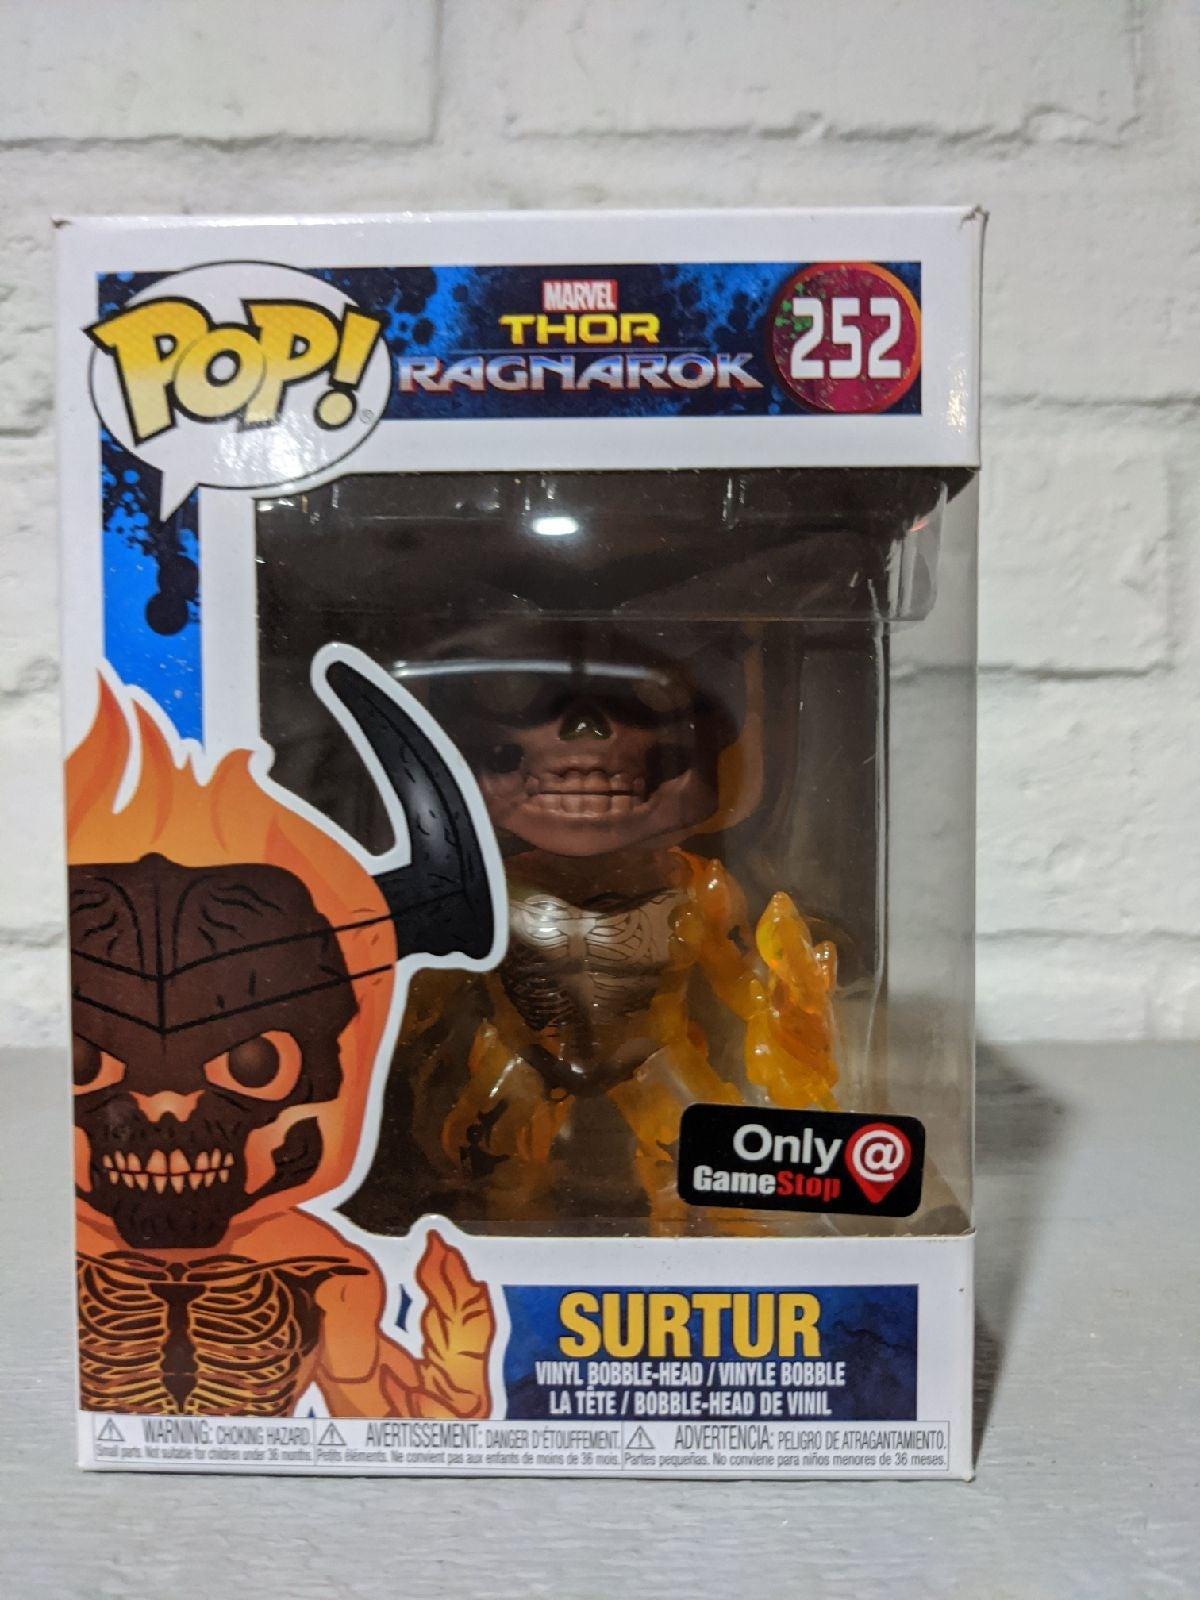 Surtur Funko Pop GameStop exclusive